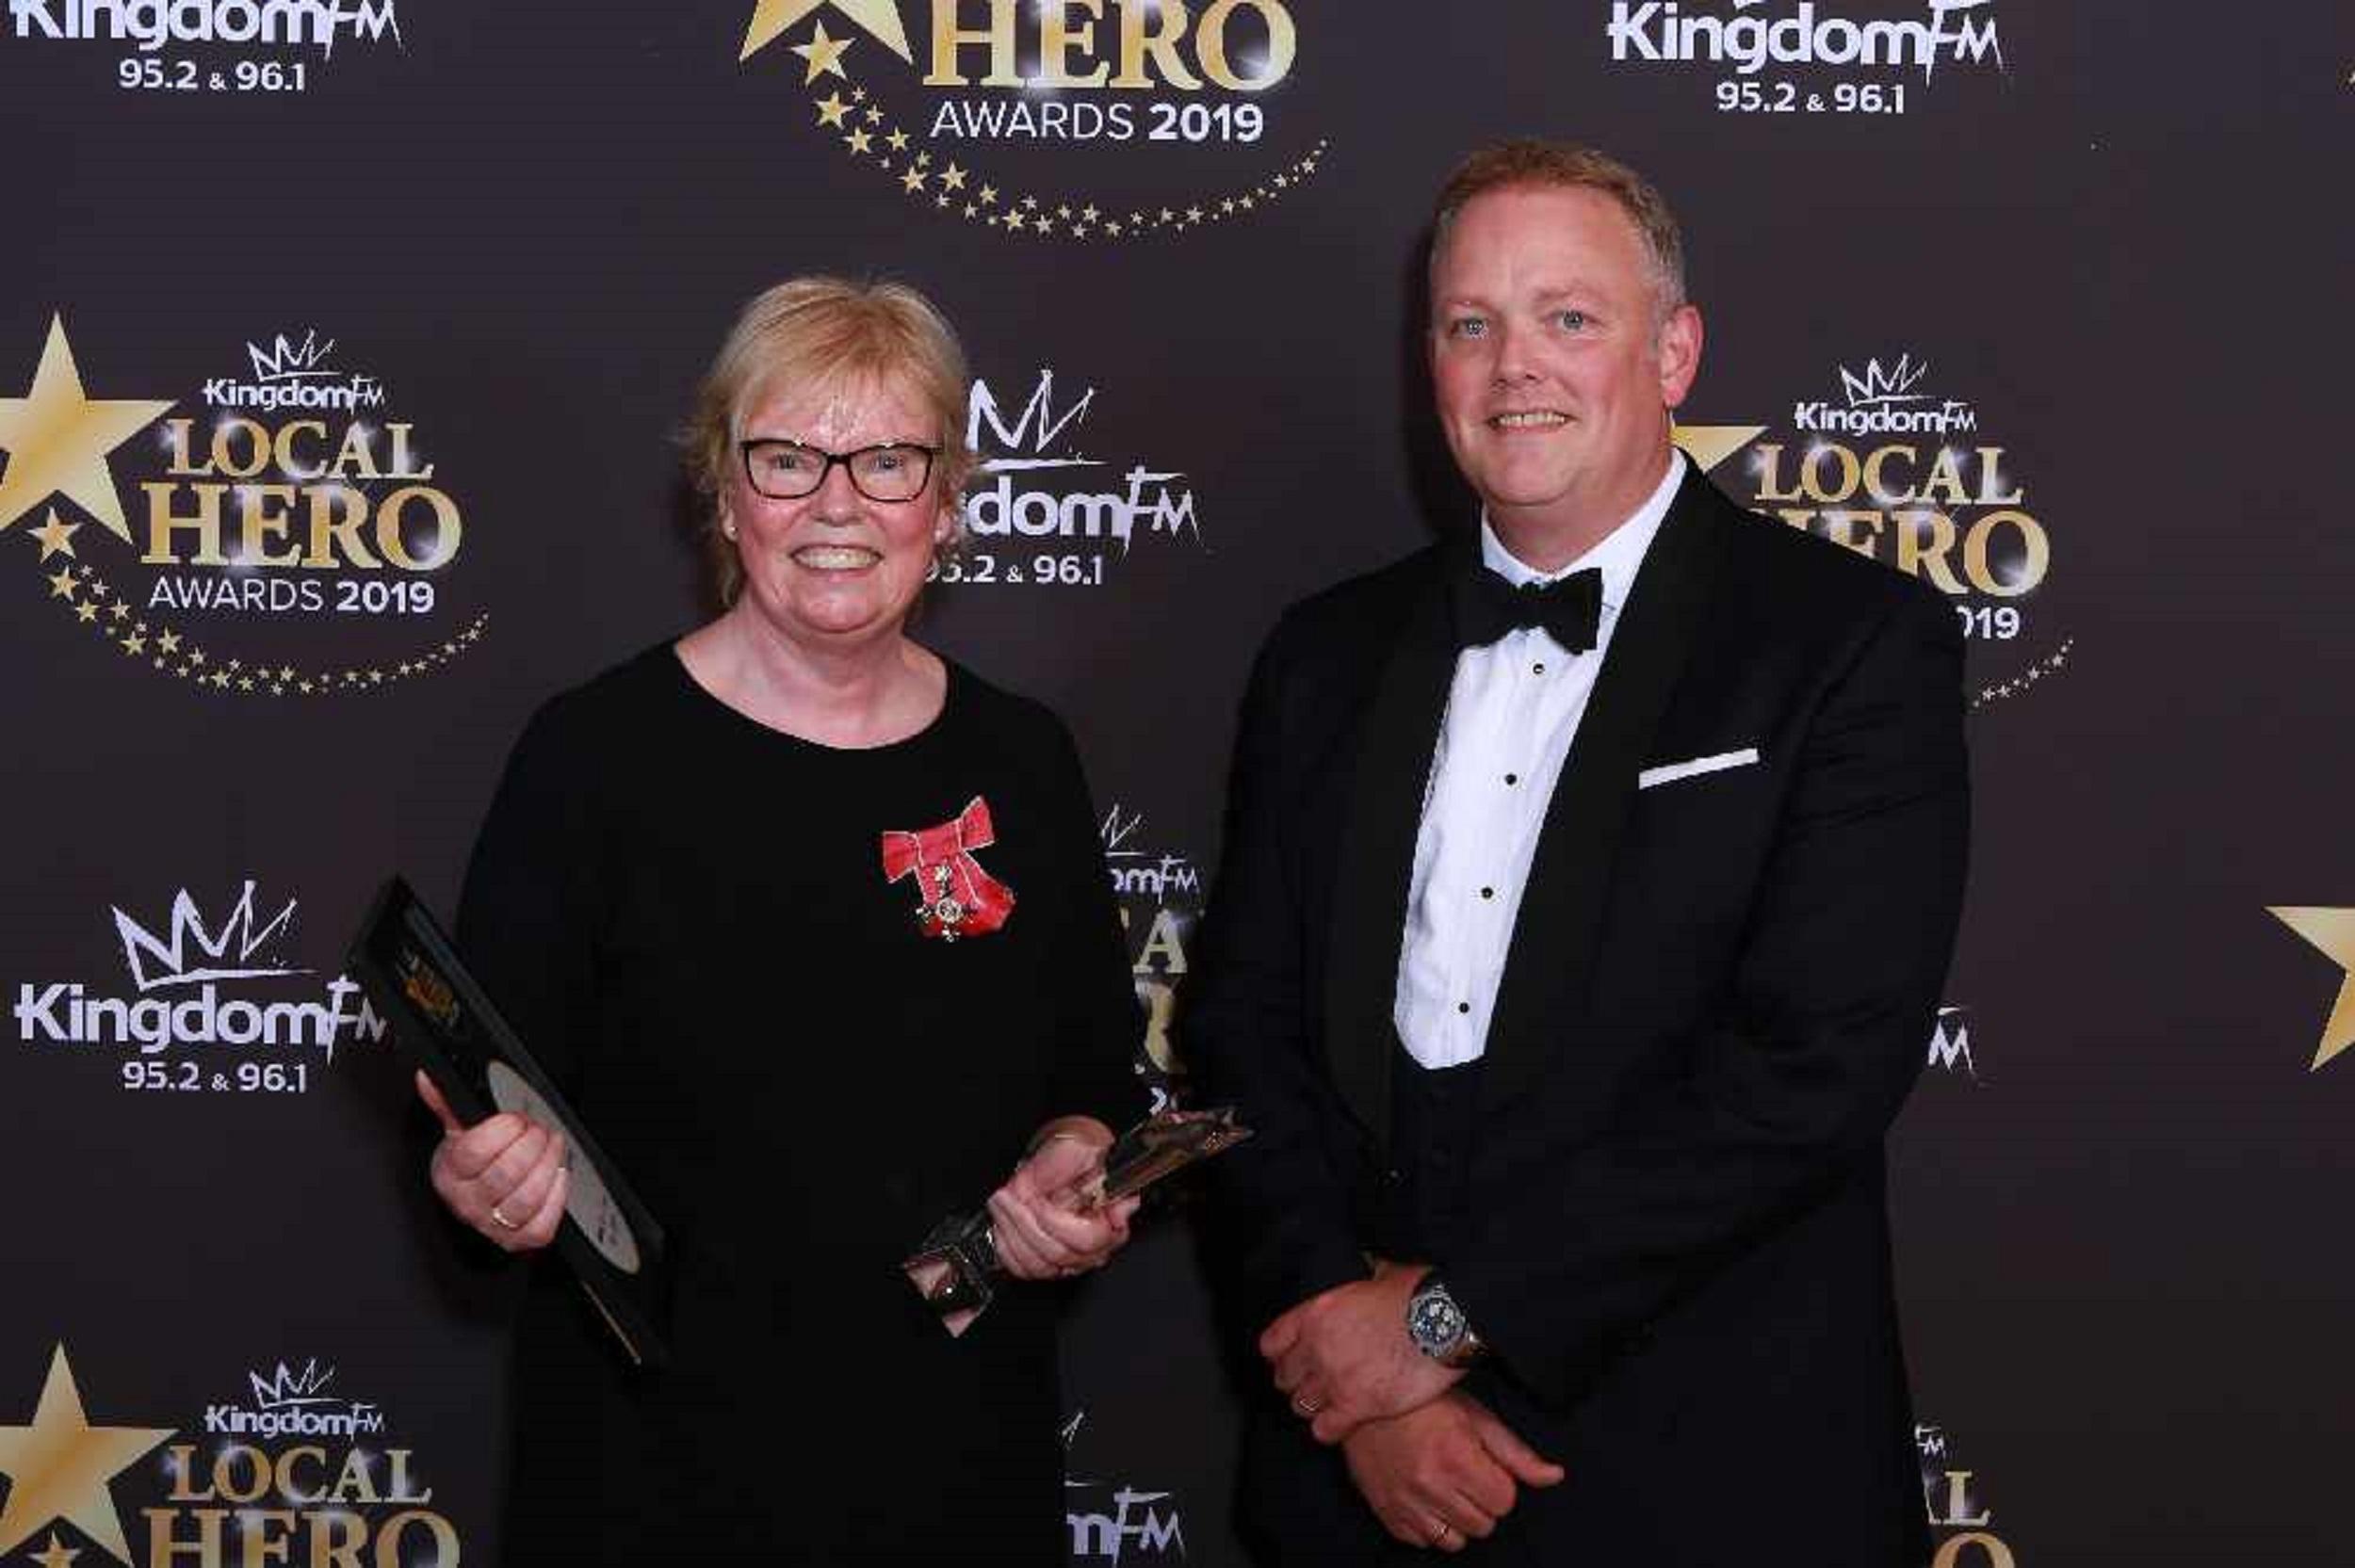 Elaine Wyllie, who won the main Kingdom FM Award last year, with DC Thomson chief executive Mike Watson last year.